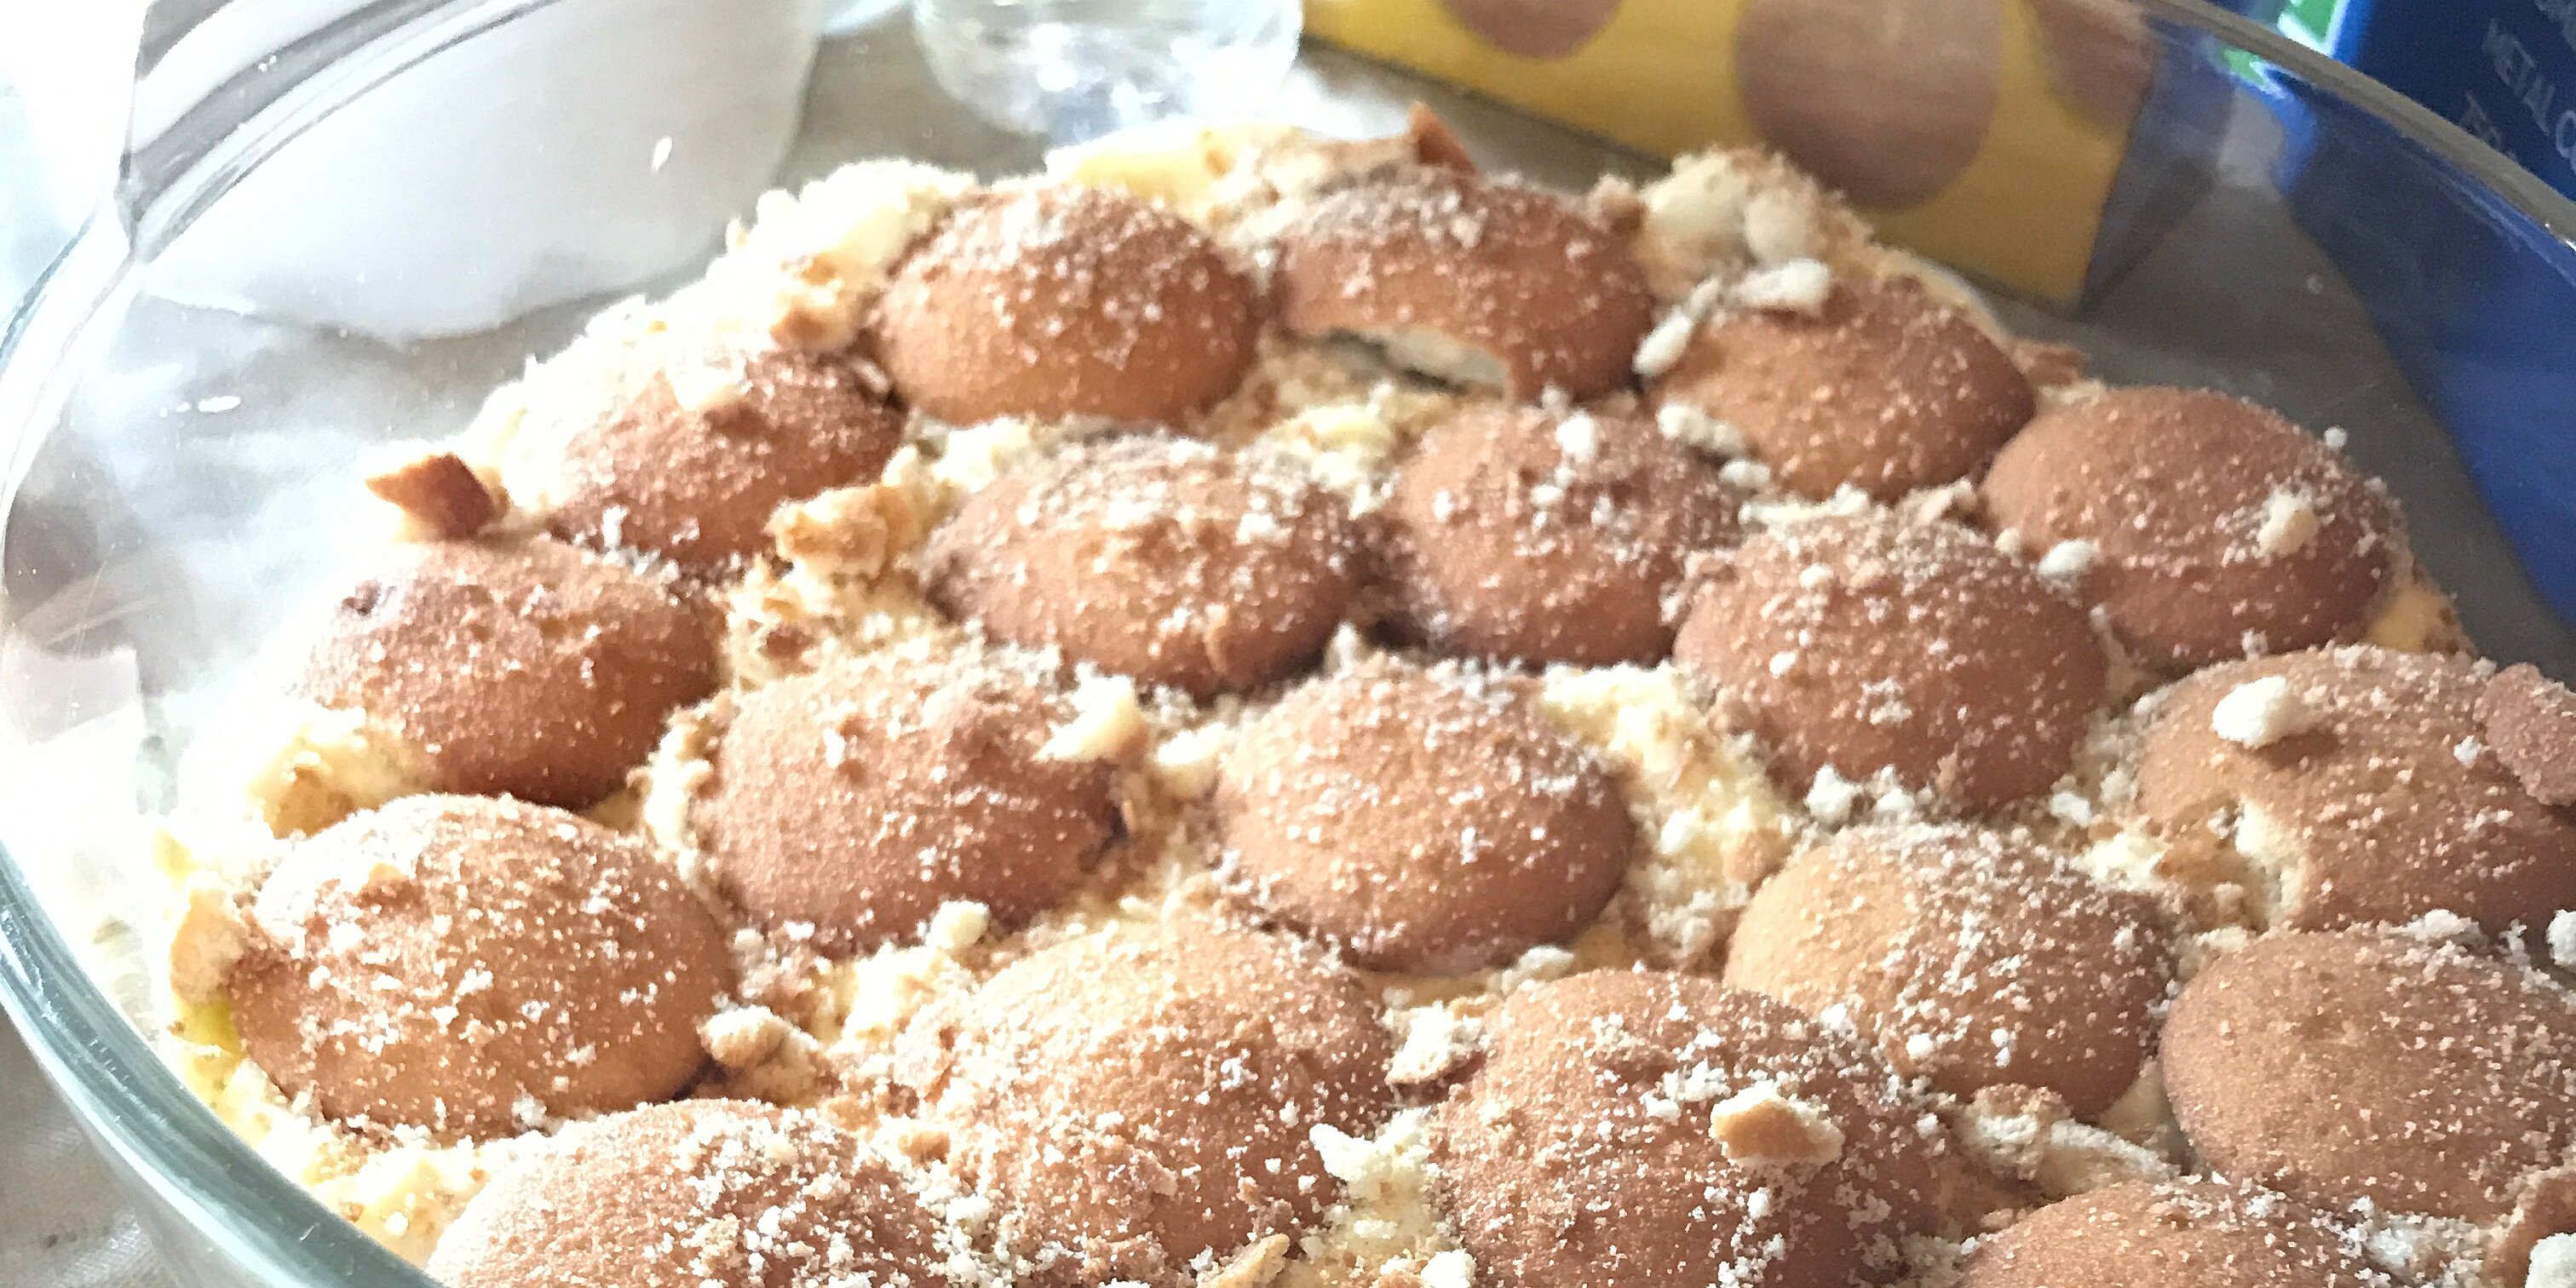 aunt bettys banana pudding recipe